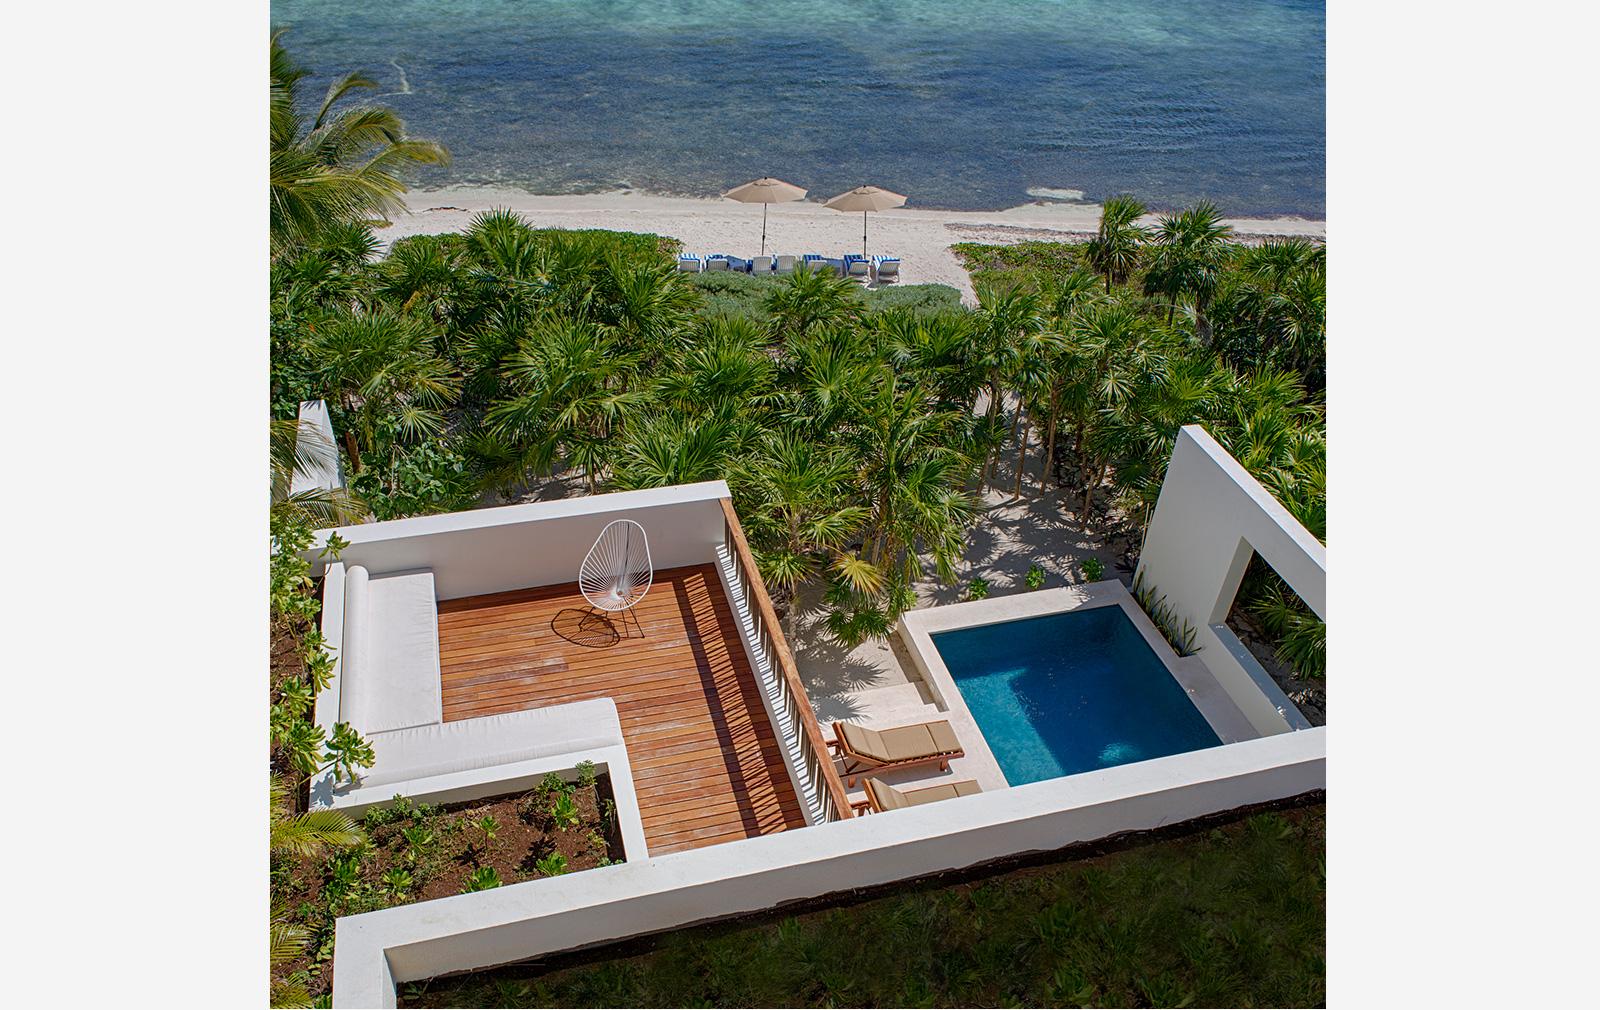 Casa Xixim Exterior - Specht Architects